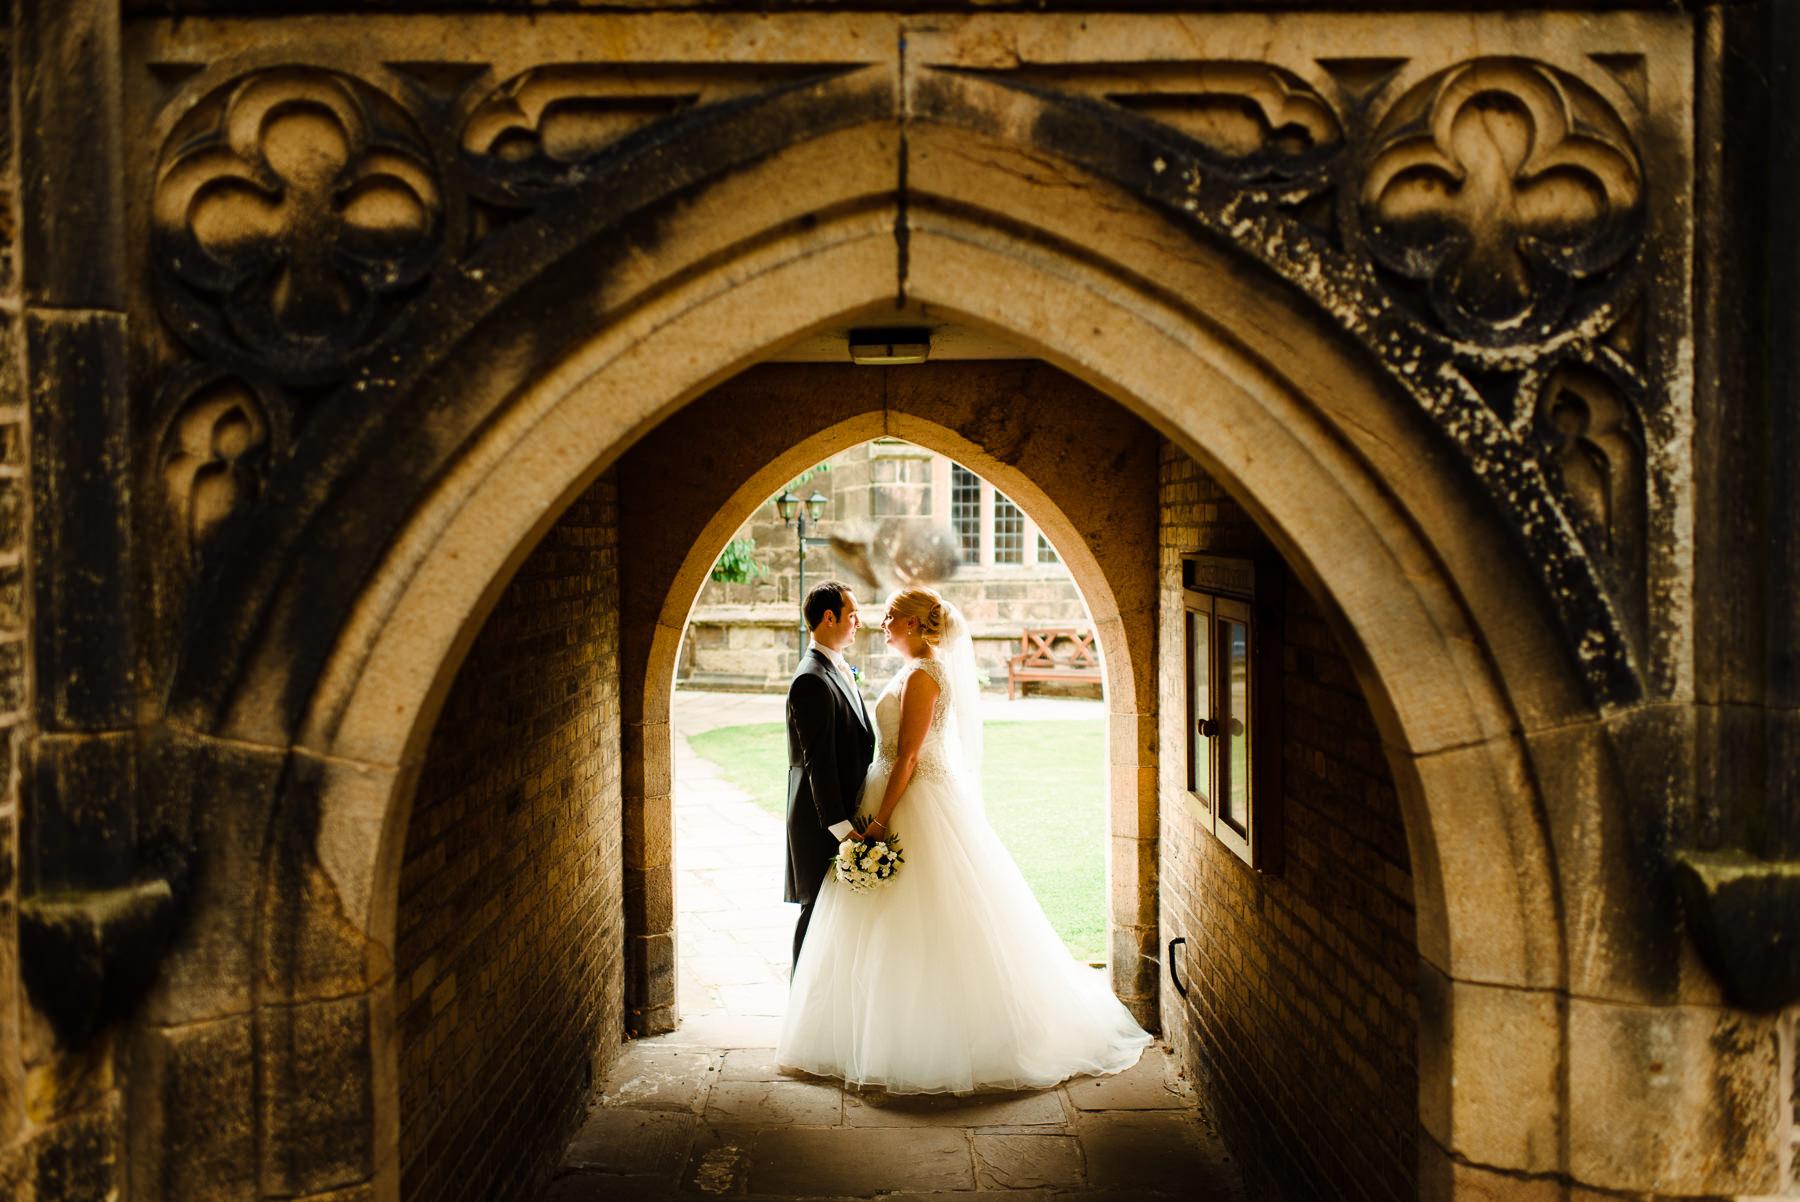 Kate & Fran at Croston church in the wedding attire